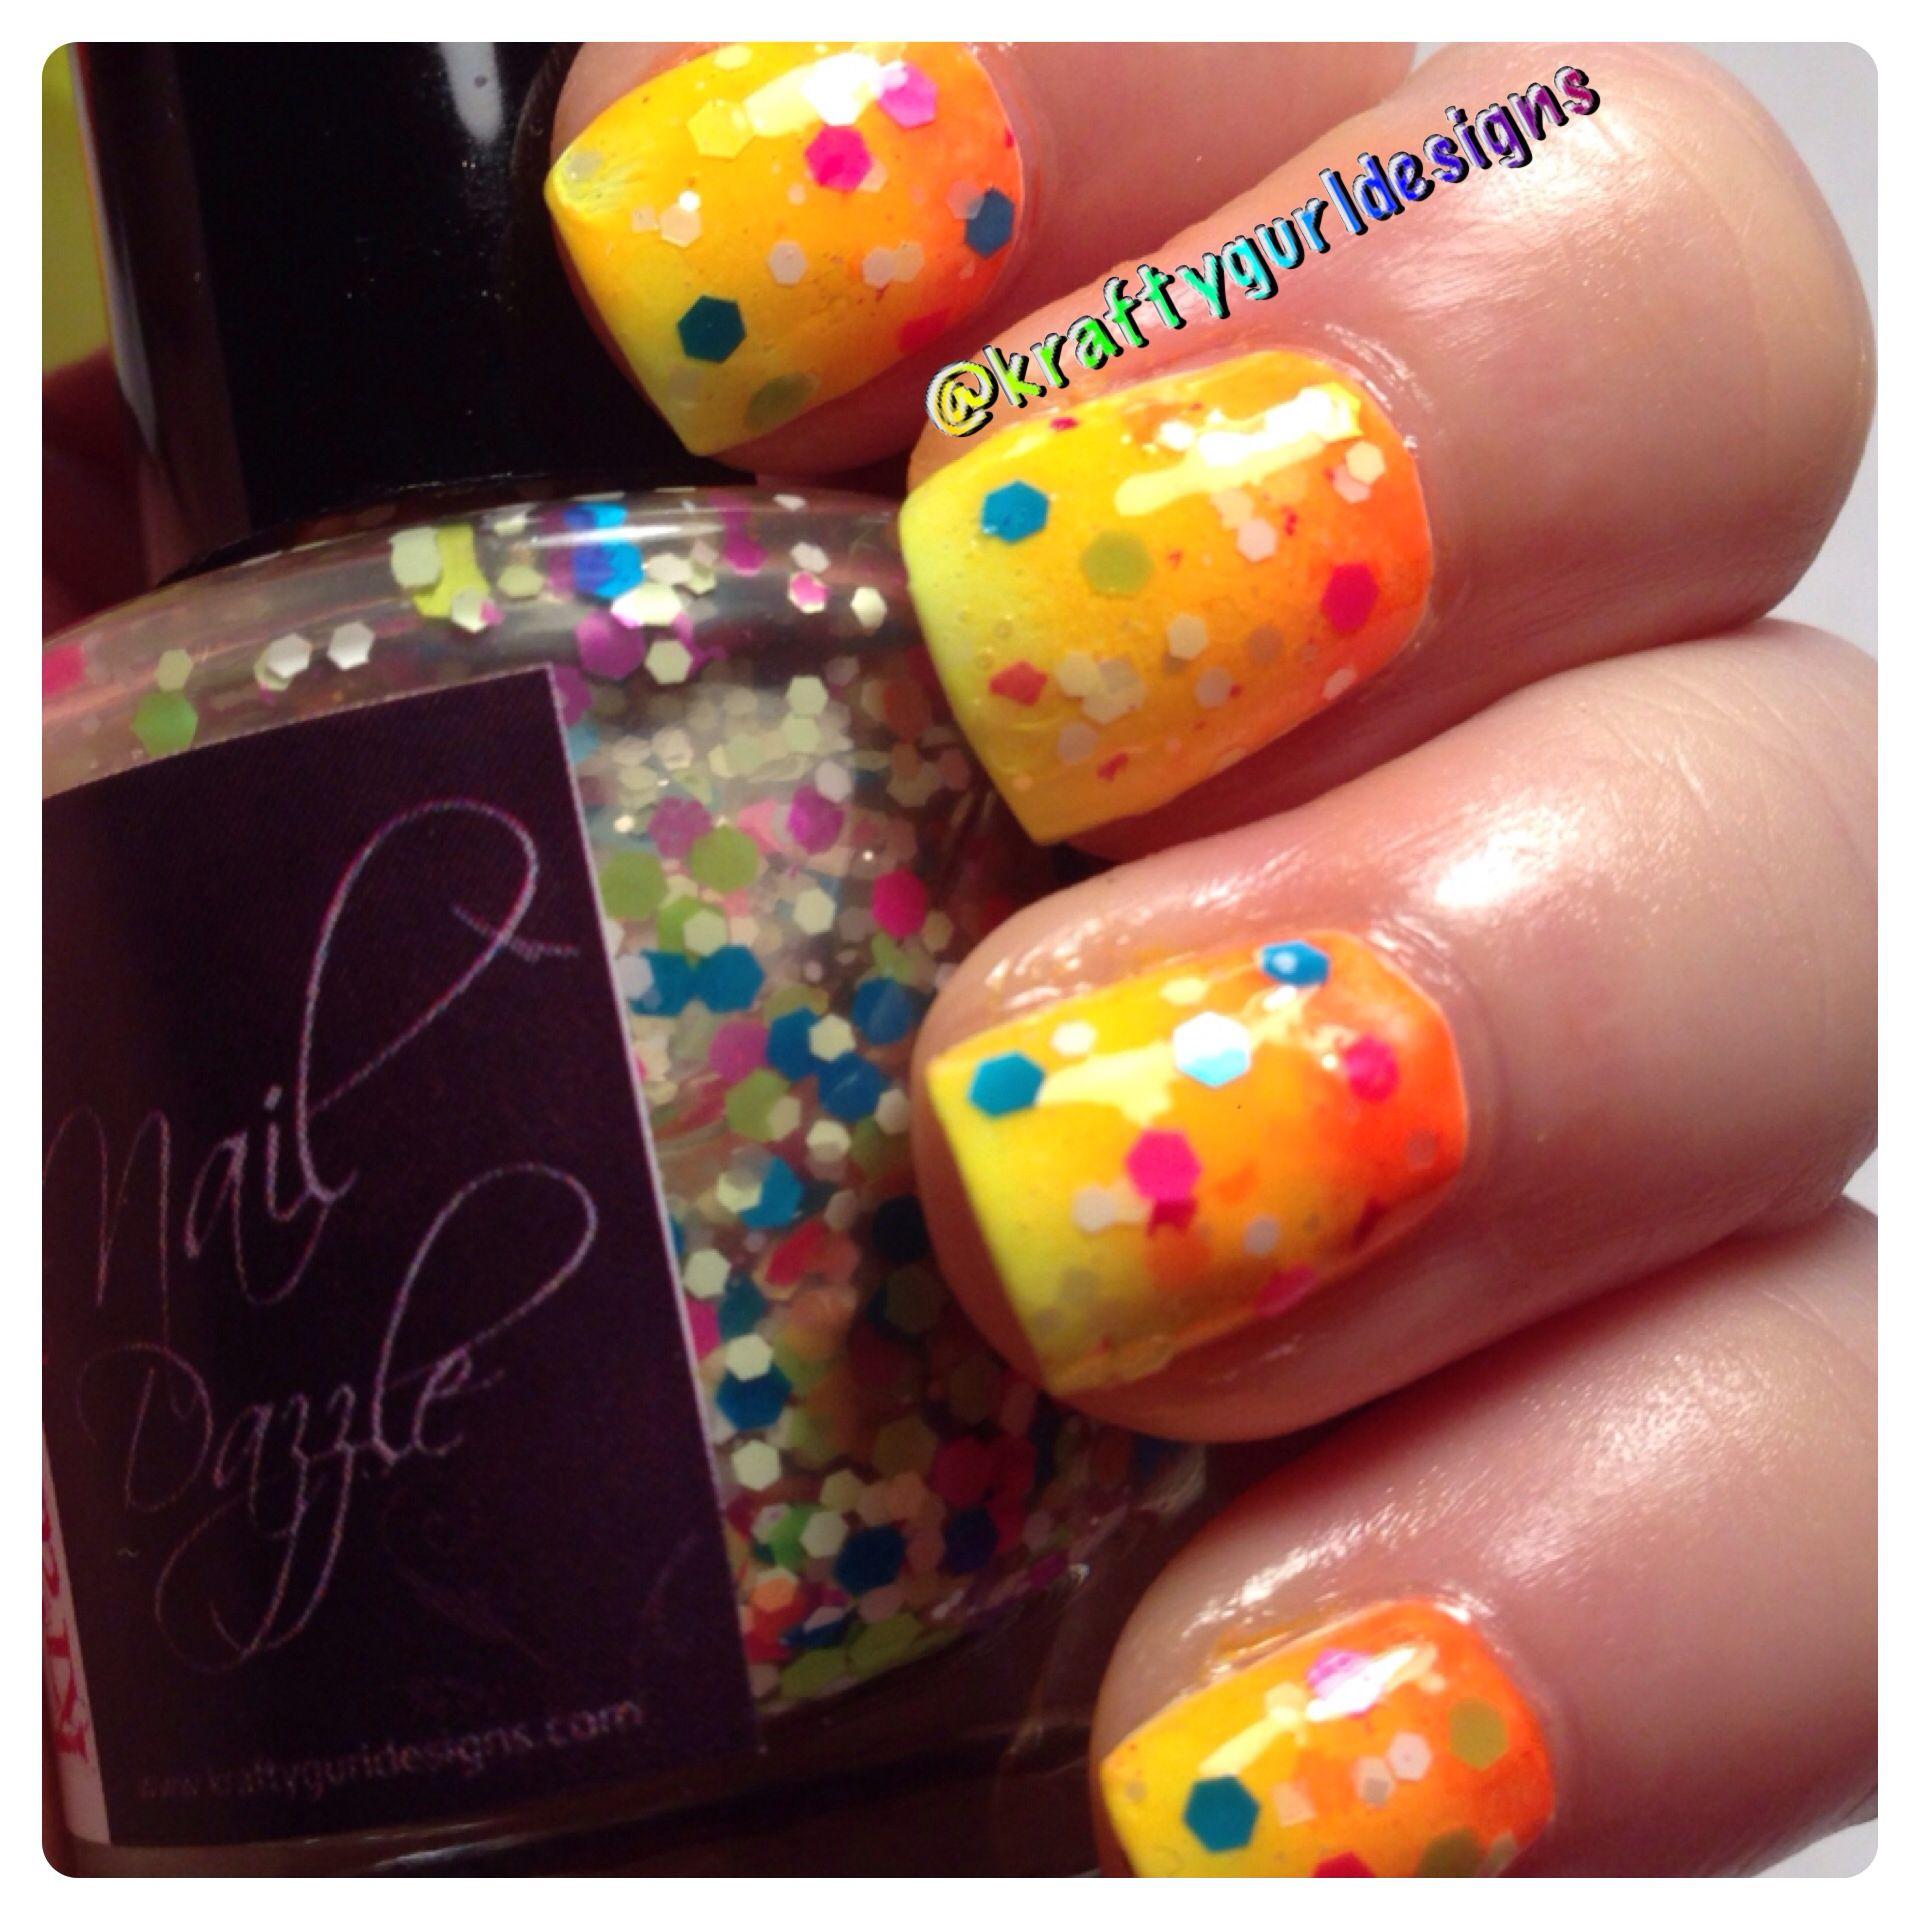 Nail art for Short nails – Summer Gradient www.kraftygurldes…